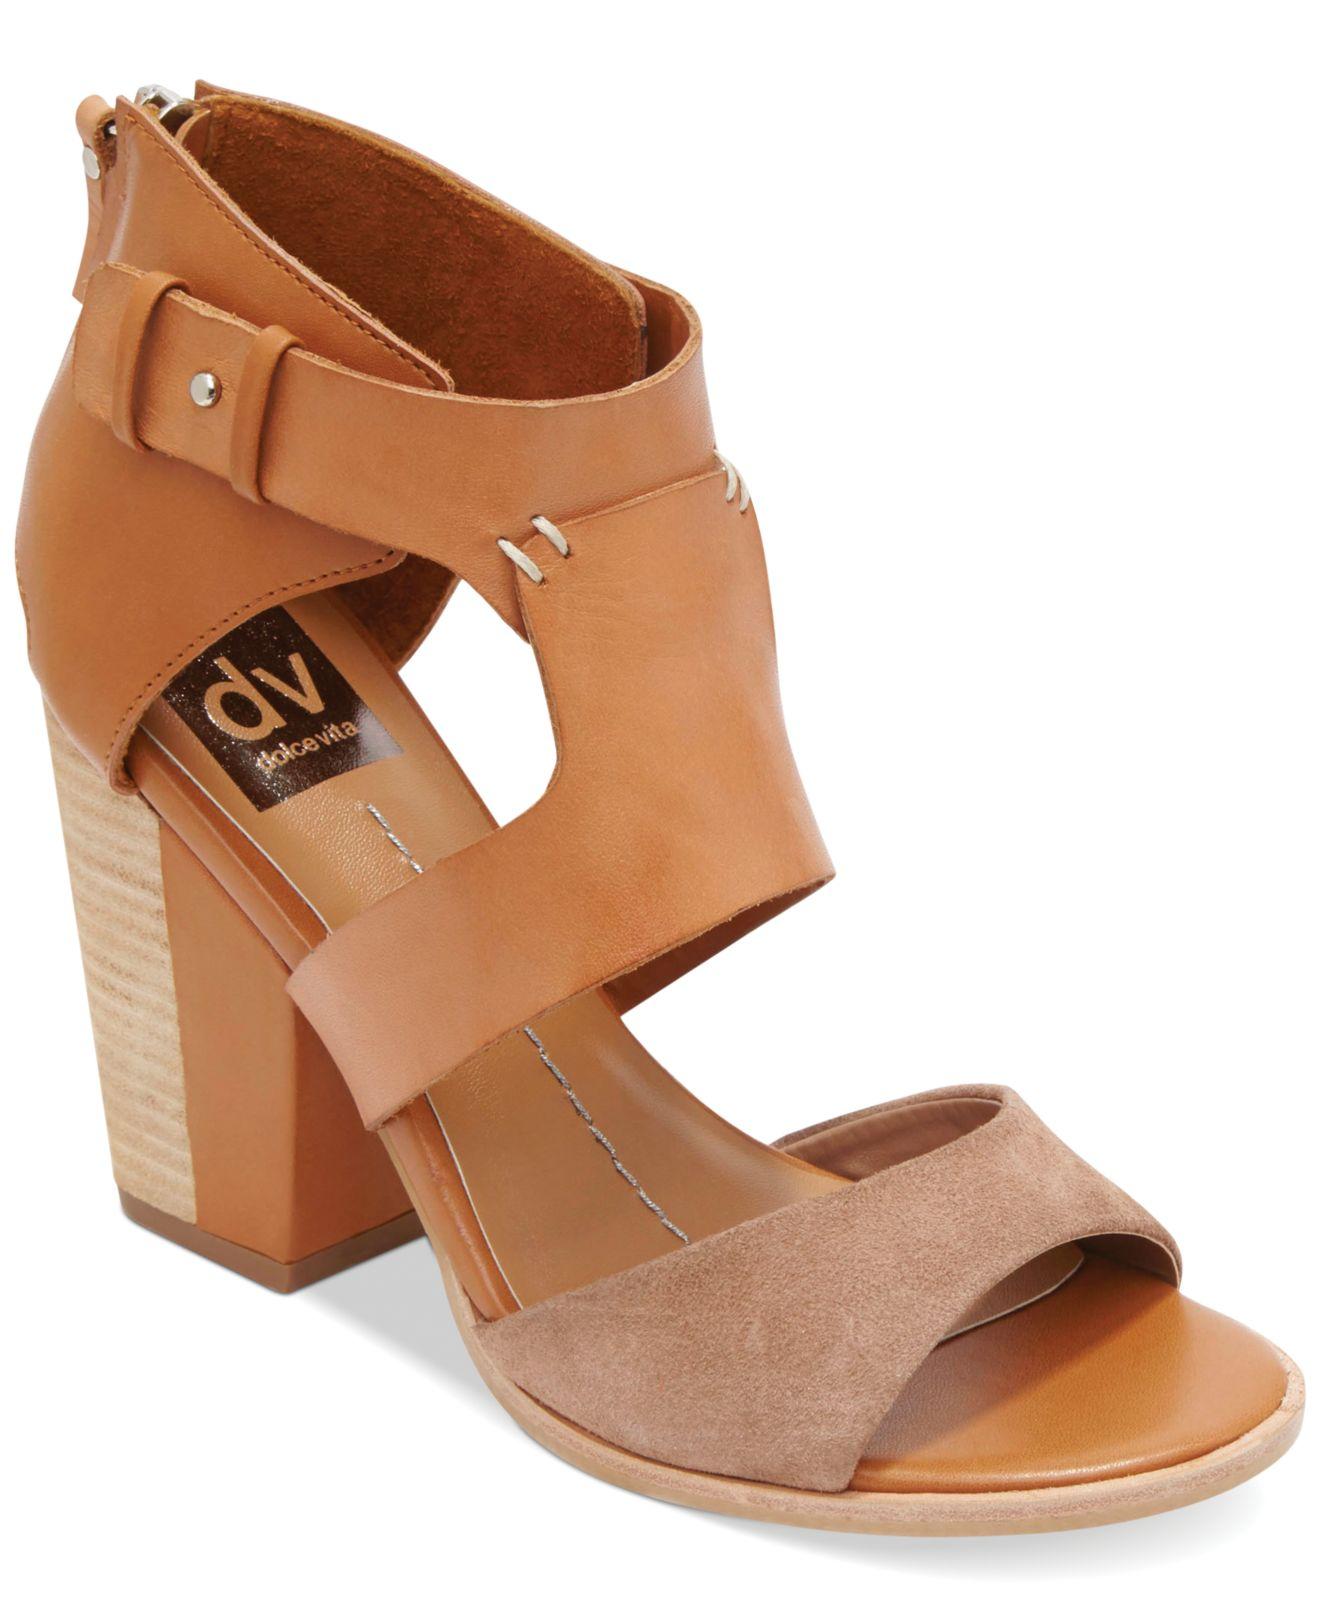 Dolce Vita Womens Noles Heeled Sandal, Black Leather